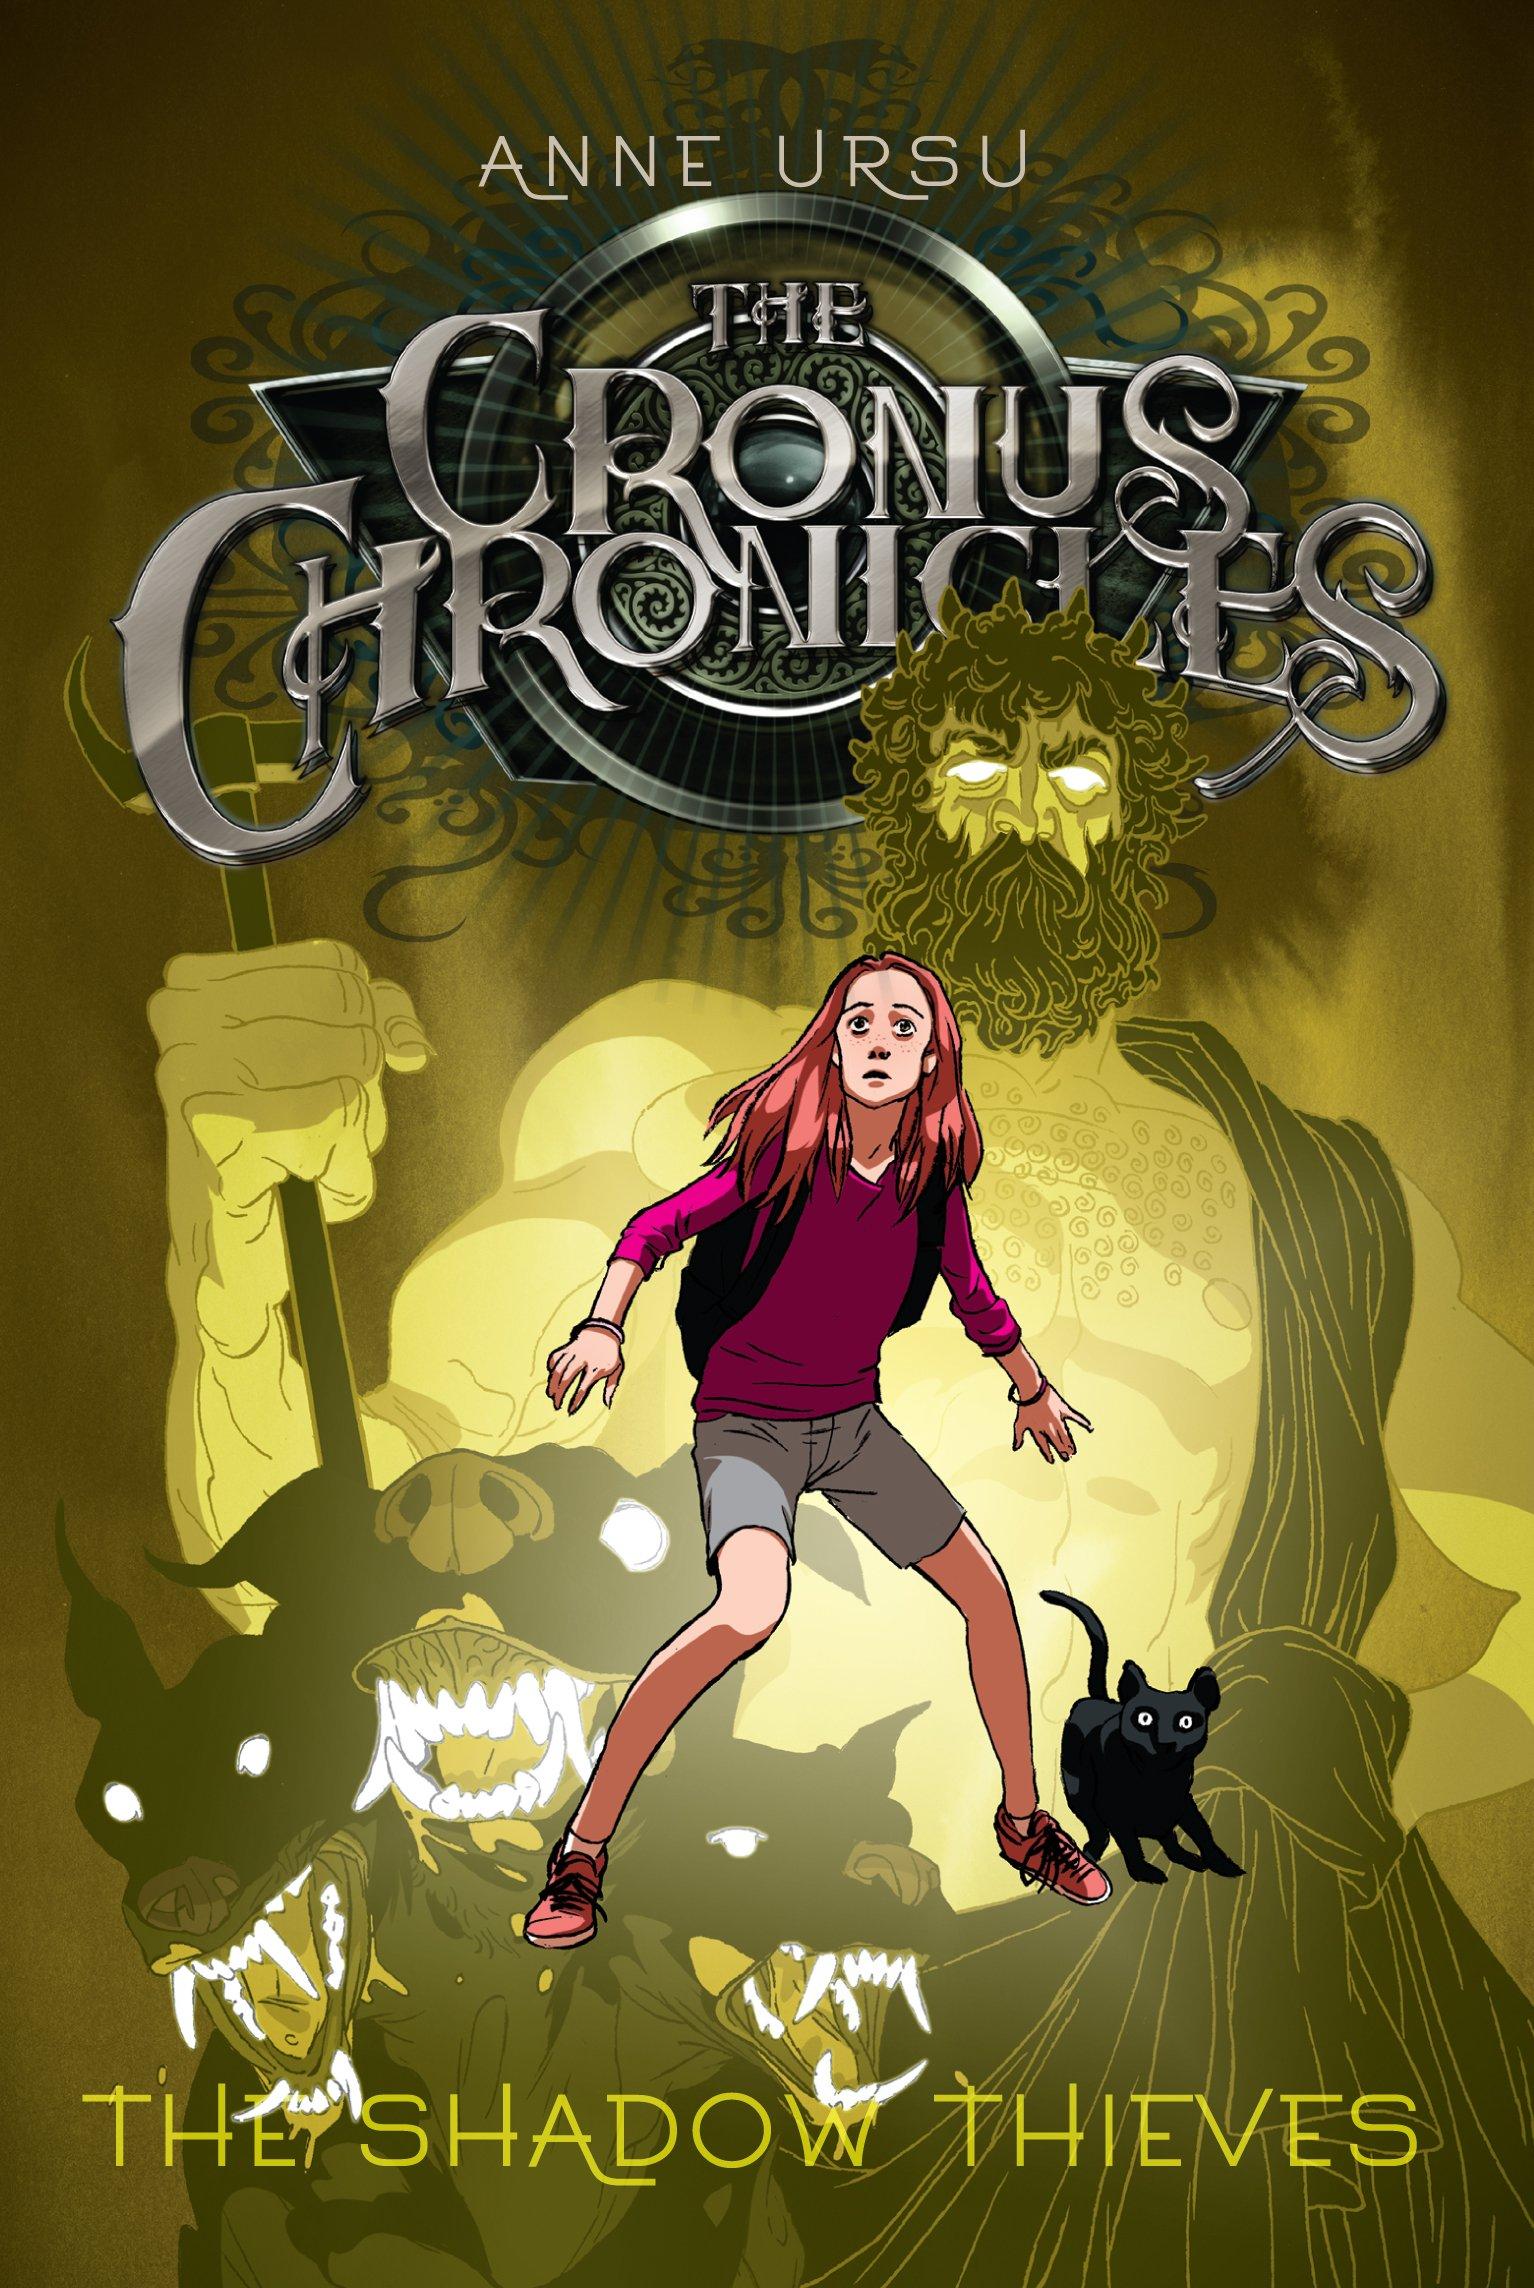 Shadow Thieves Cronus Chronicles